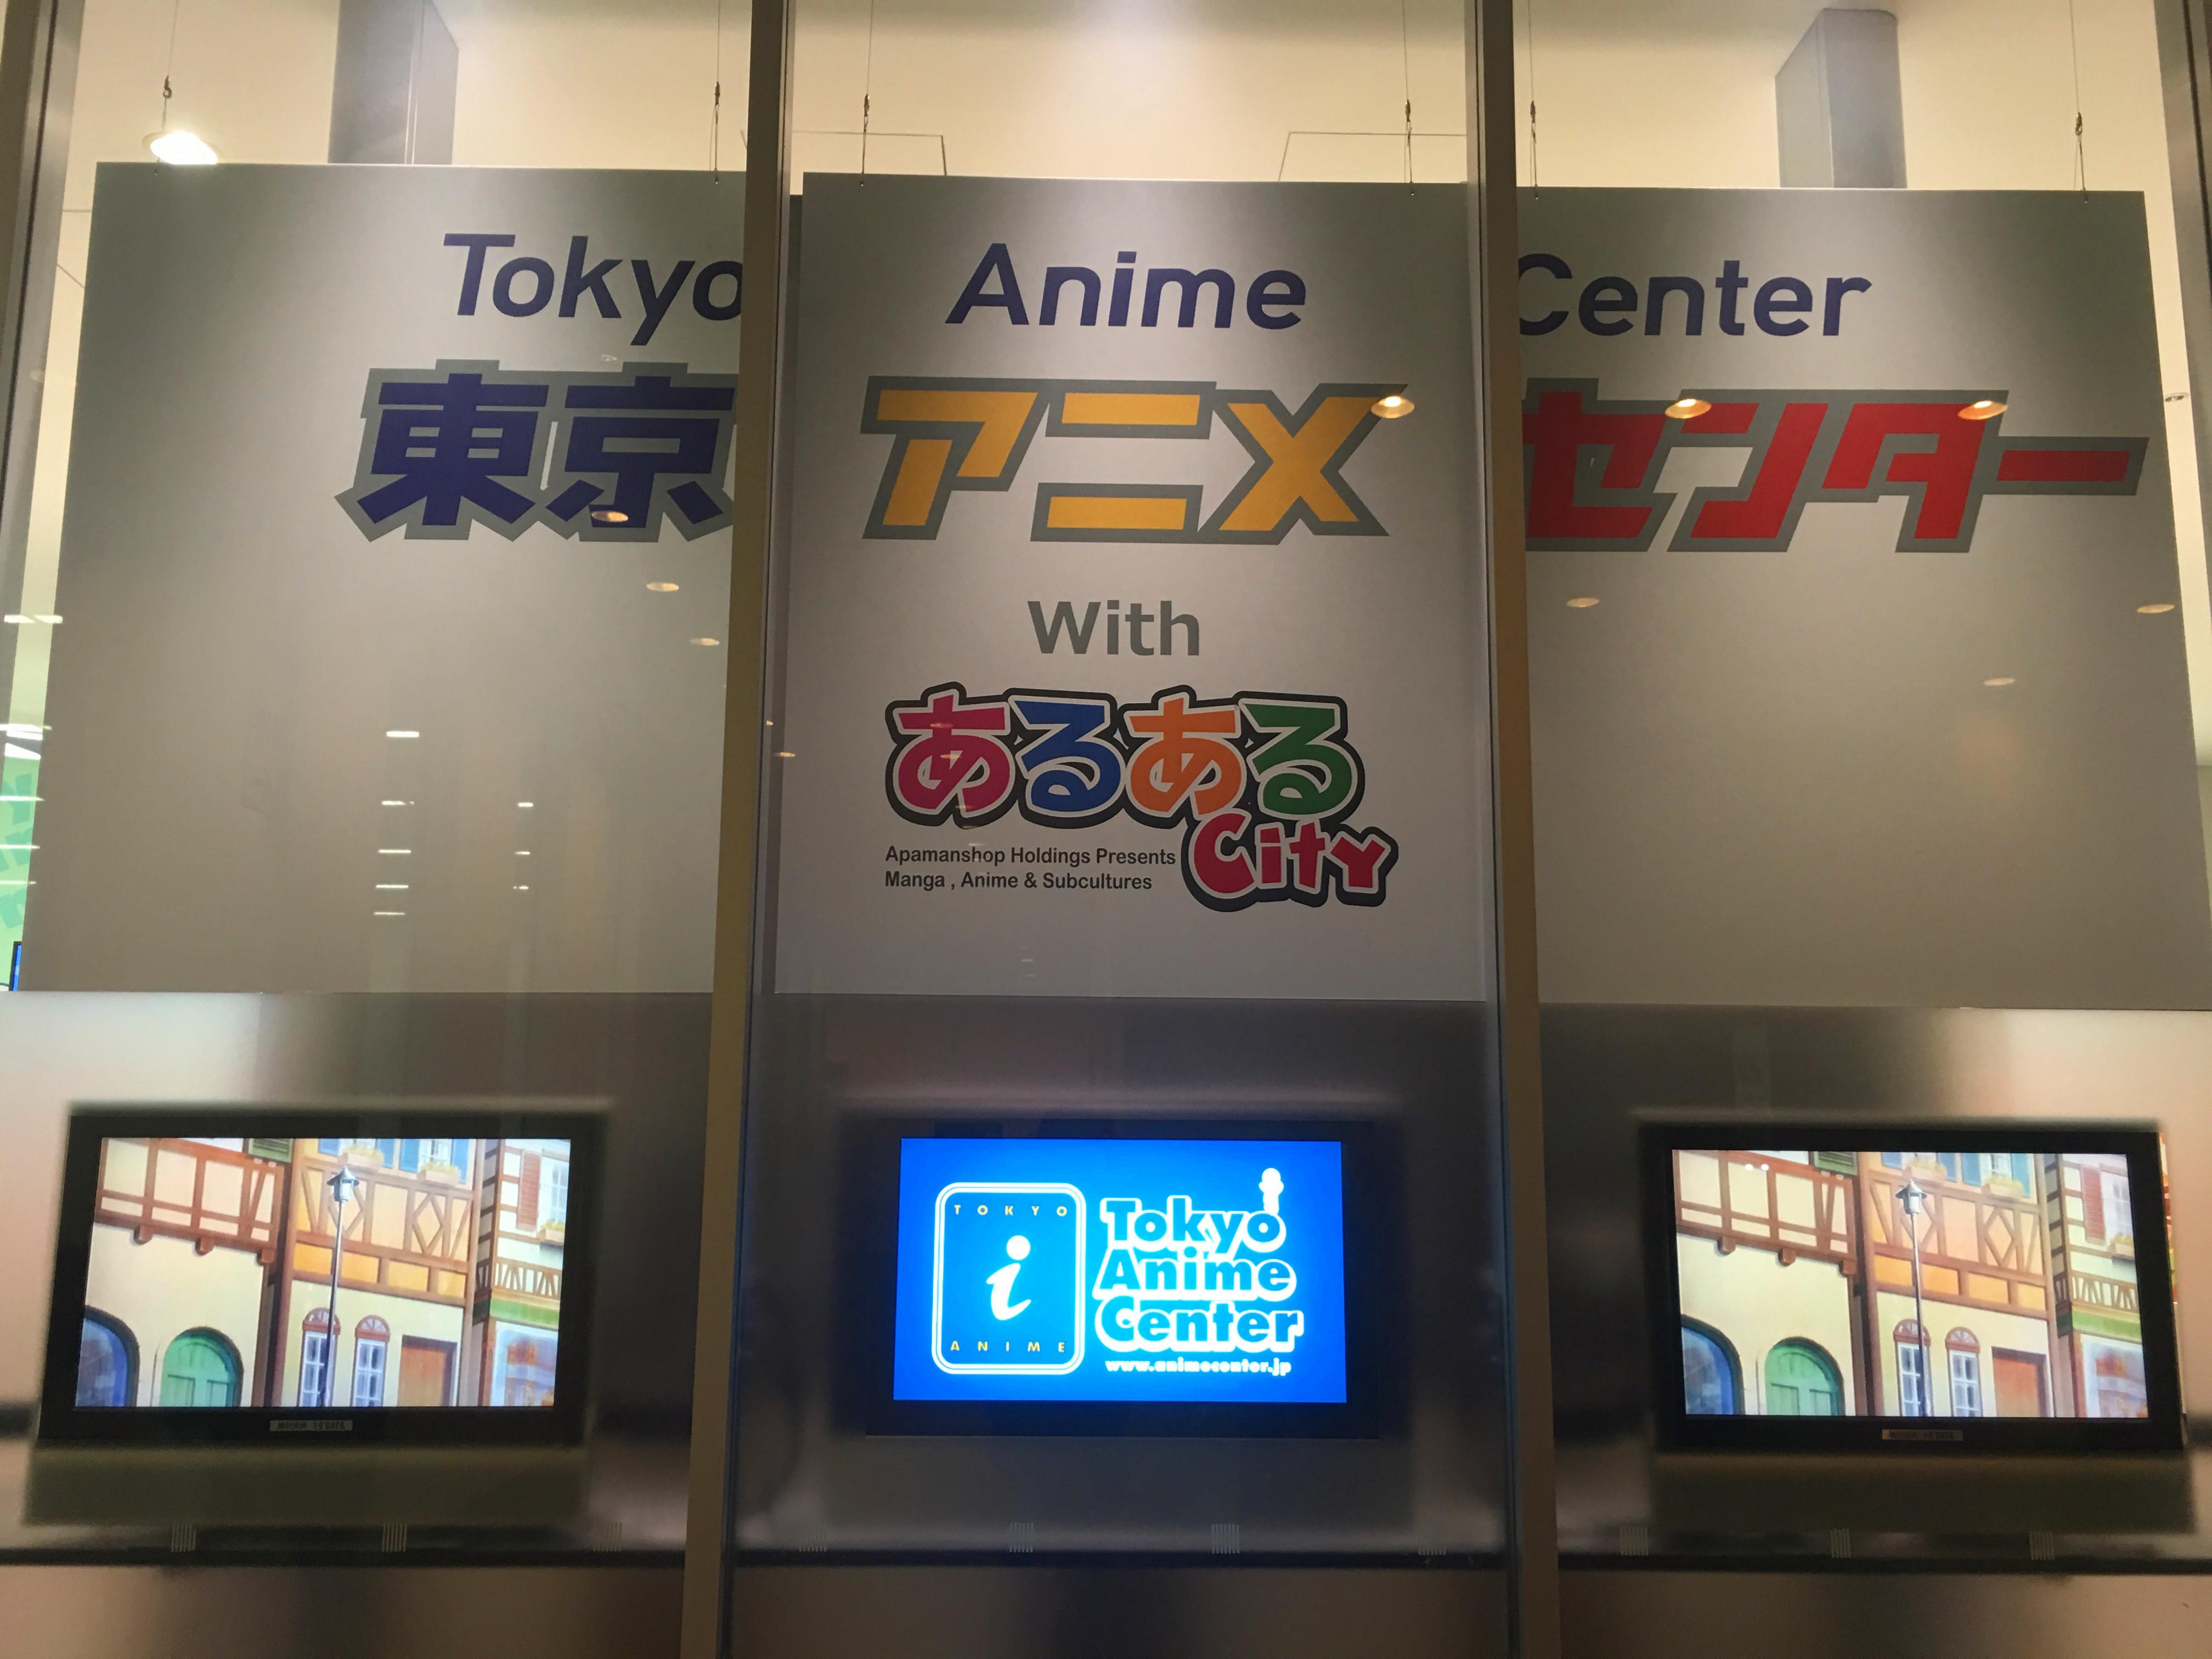 Image result for tokyo anime center images